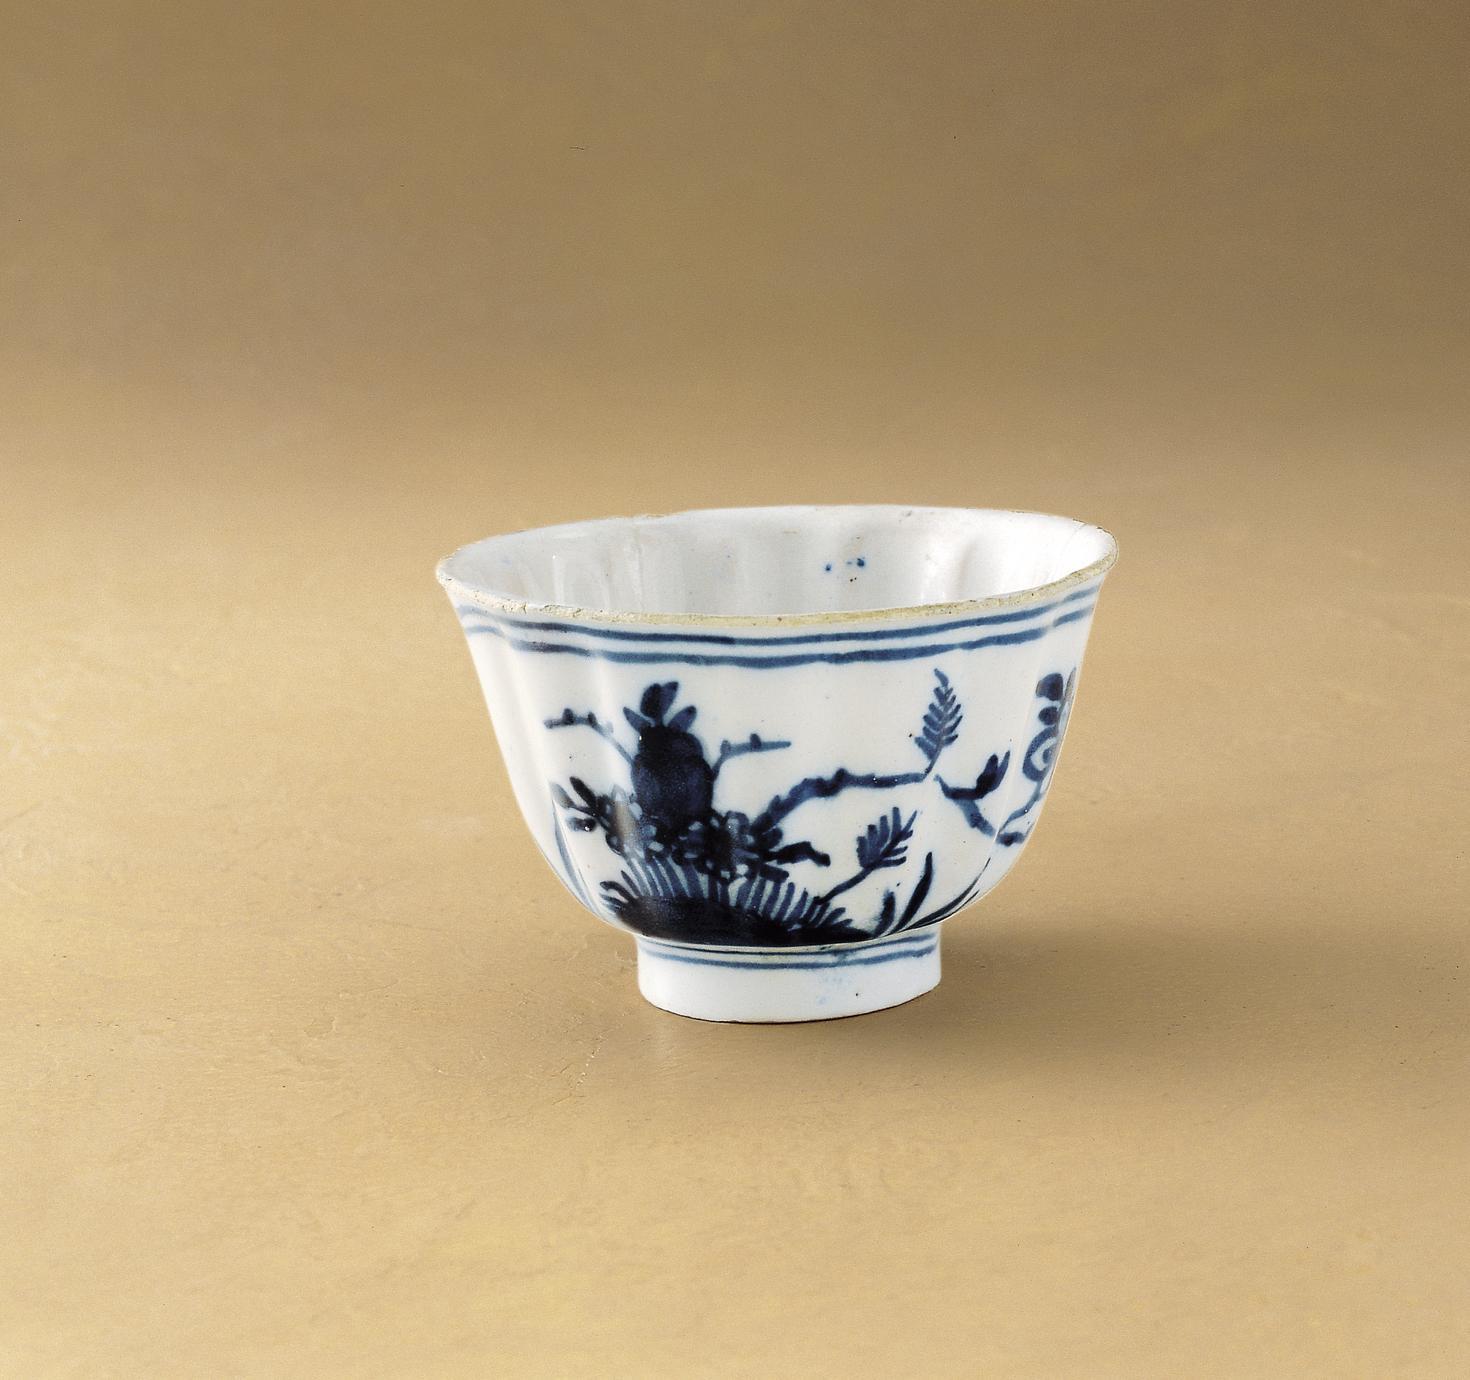 Teabowl (1 of 2)